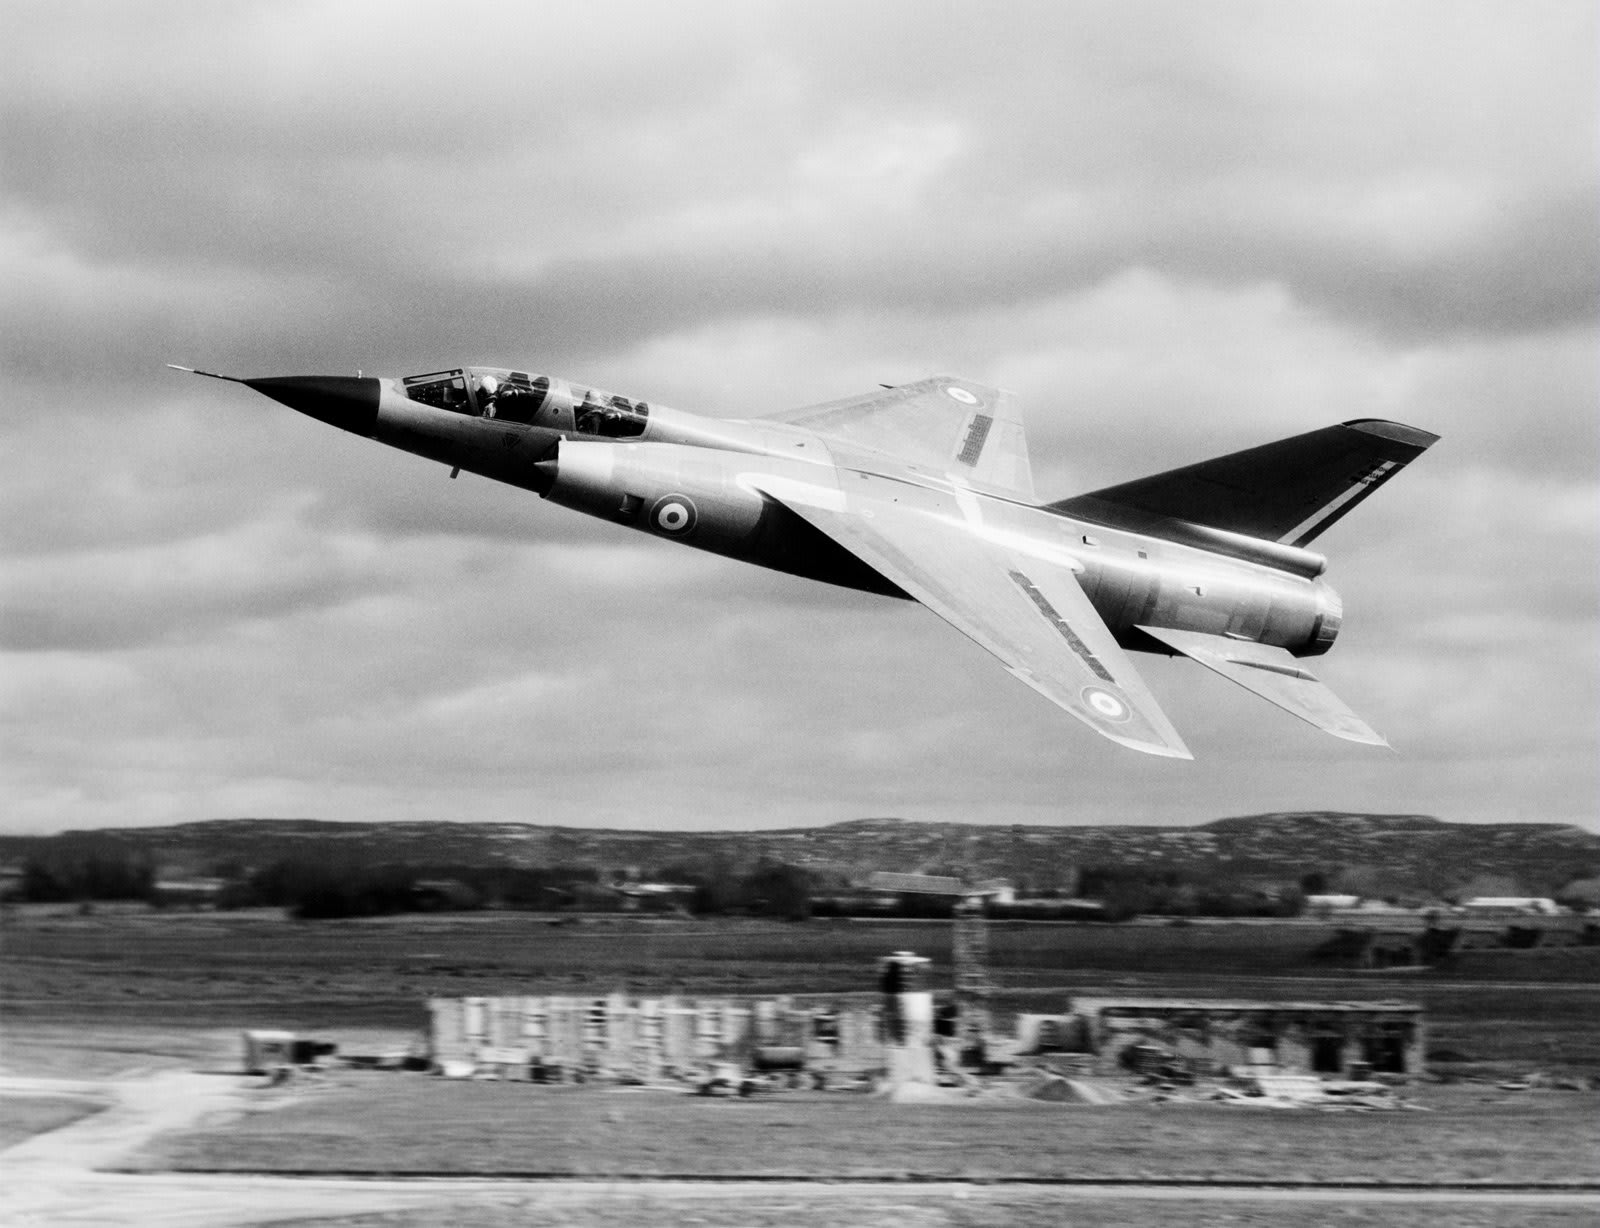 Mirage III F2 F3: origins, characteristics and performance data